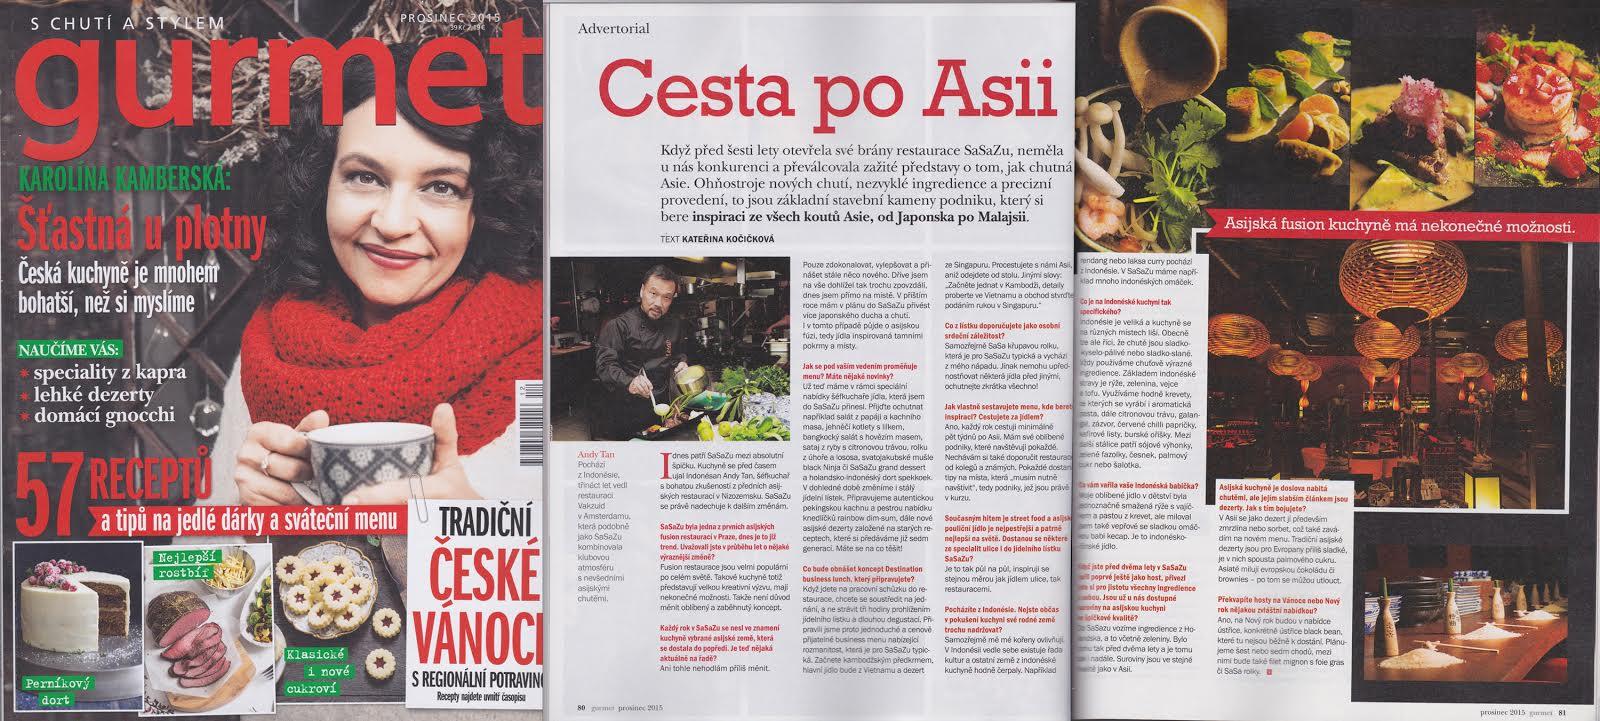 Gurmet article